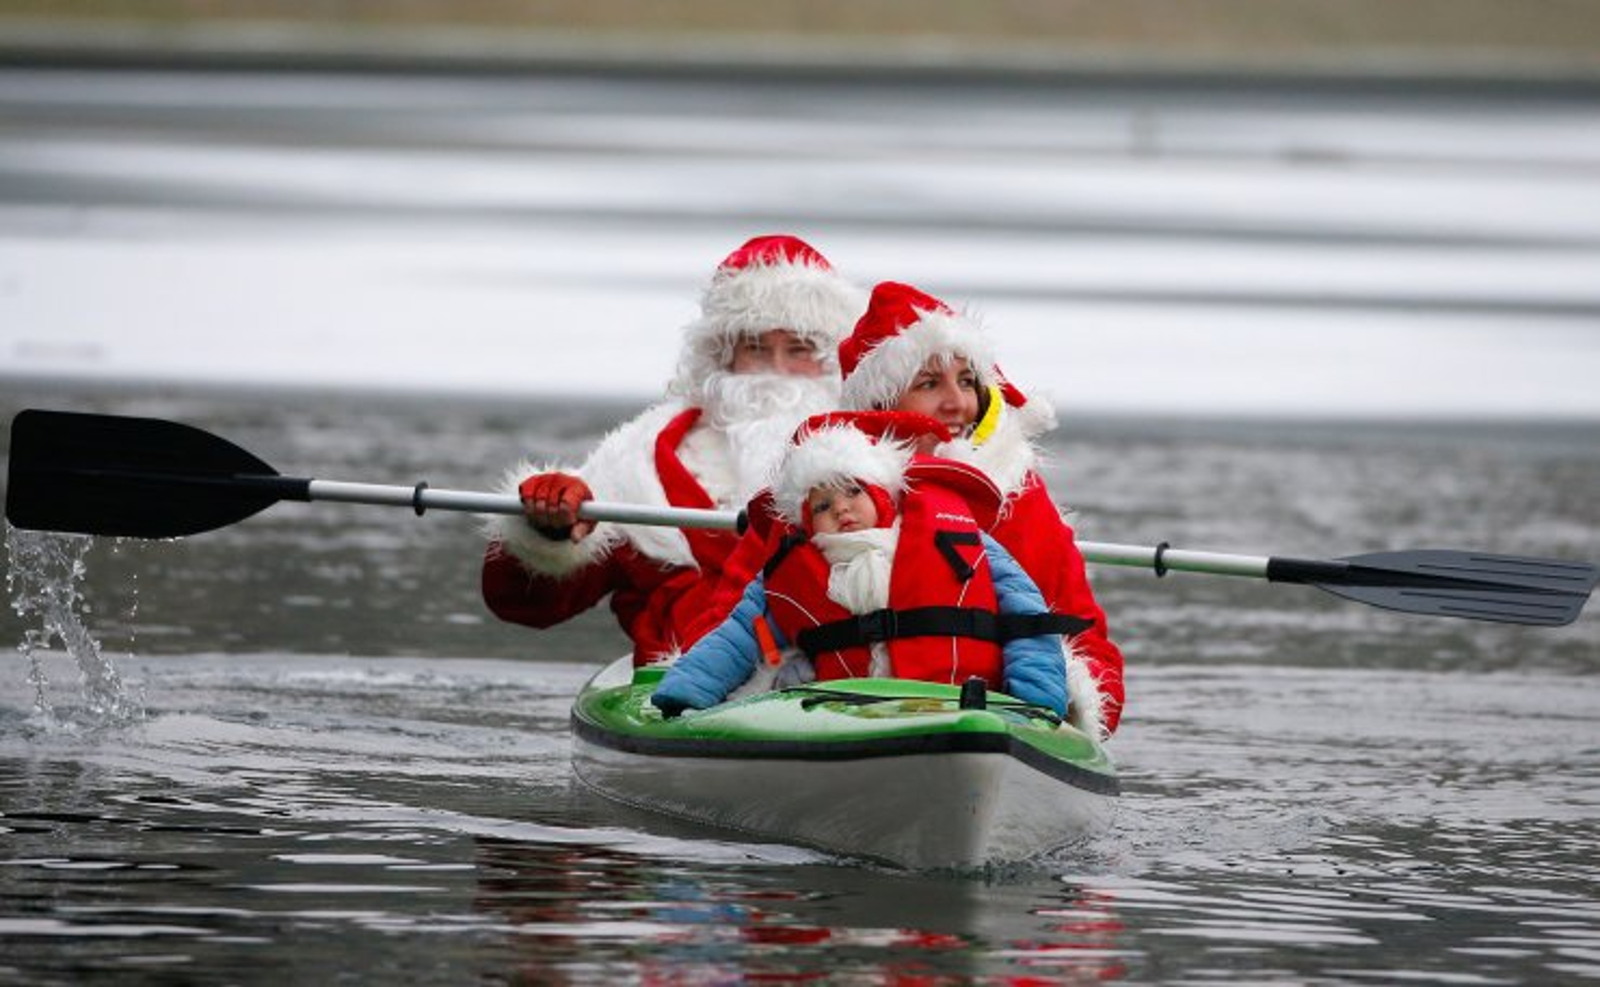 Belarusians dressed as Santa Clauses swim in a kayak during country's Santa Run in Minsk, Belarus December 14, 2019. Reuters